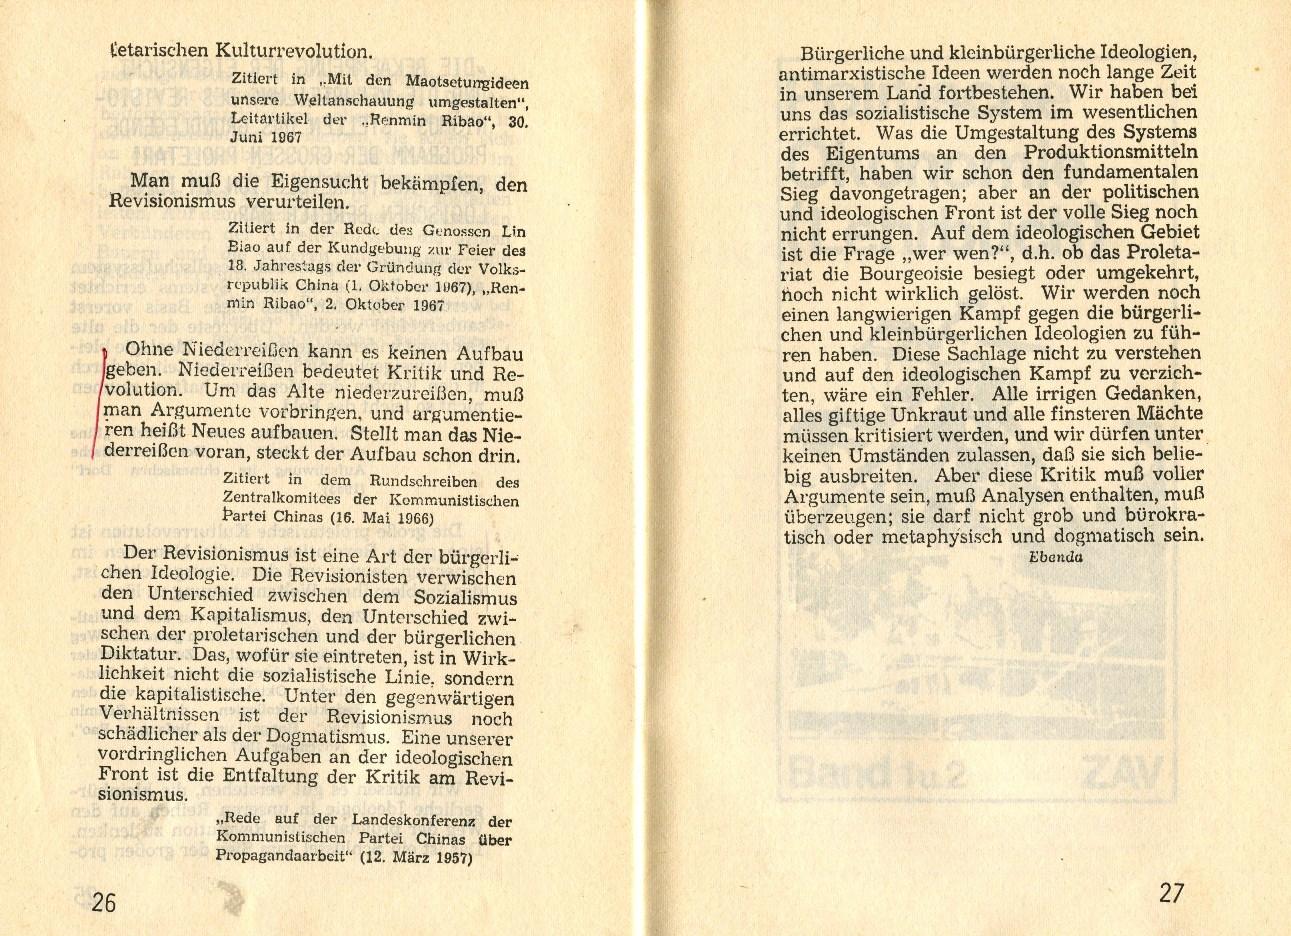 ZB_Mao_Revolutionstheorie_1971_15